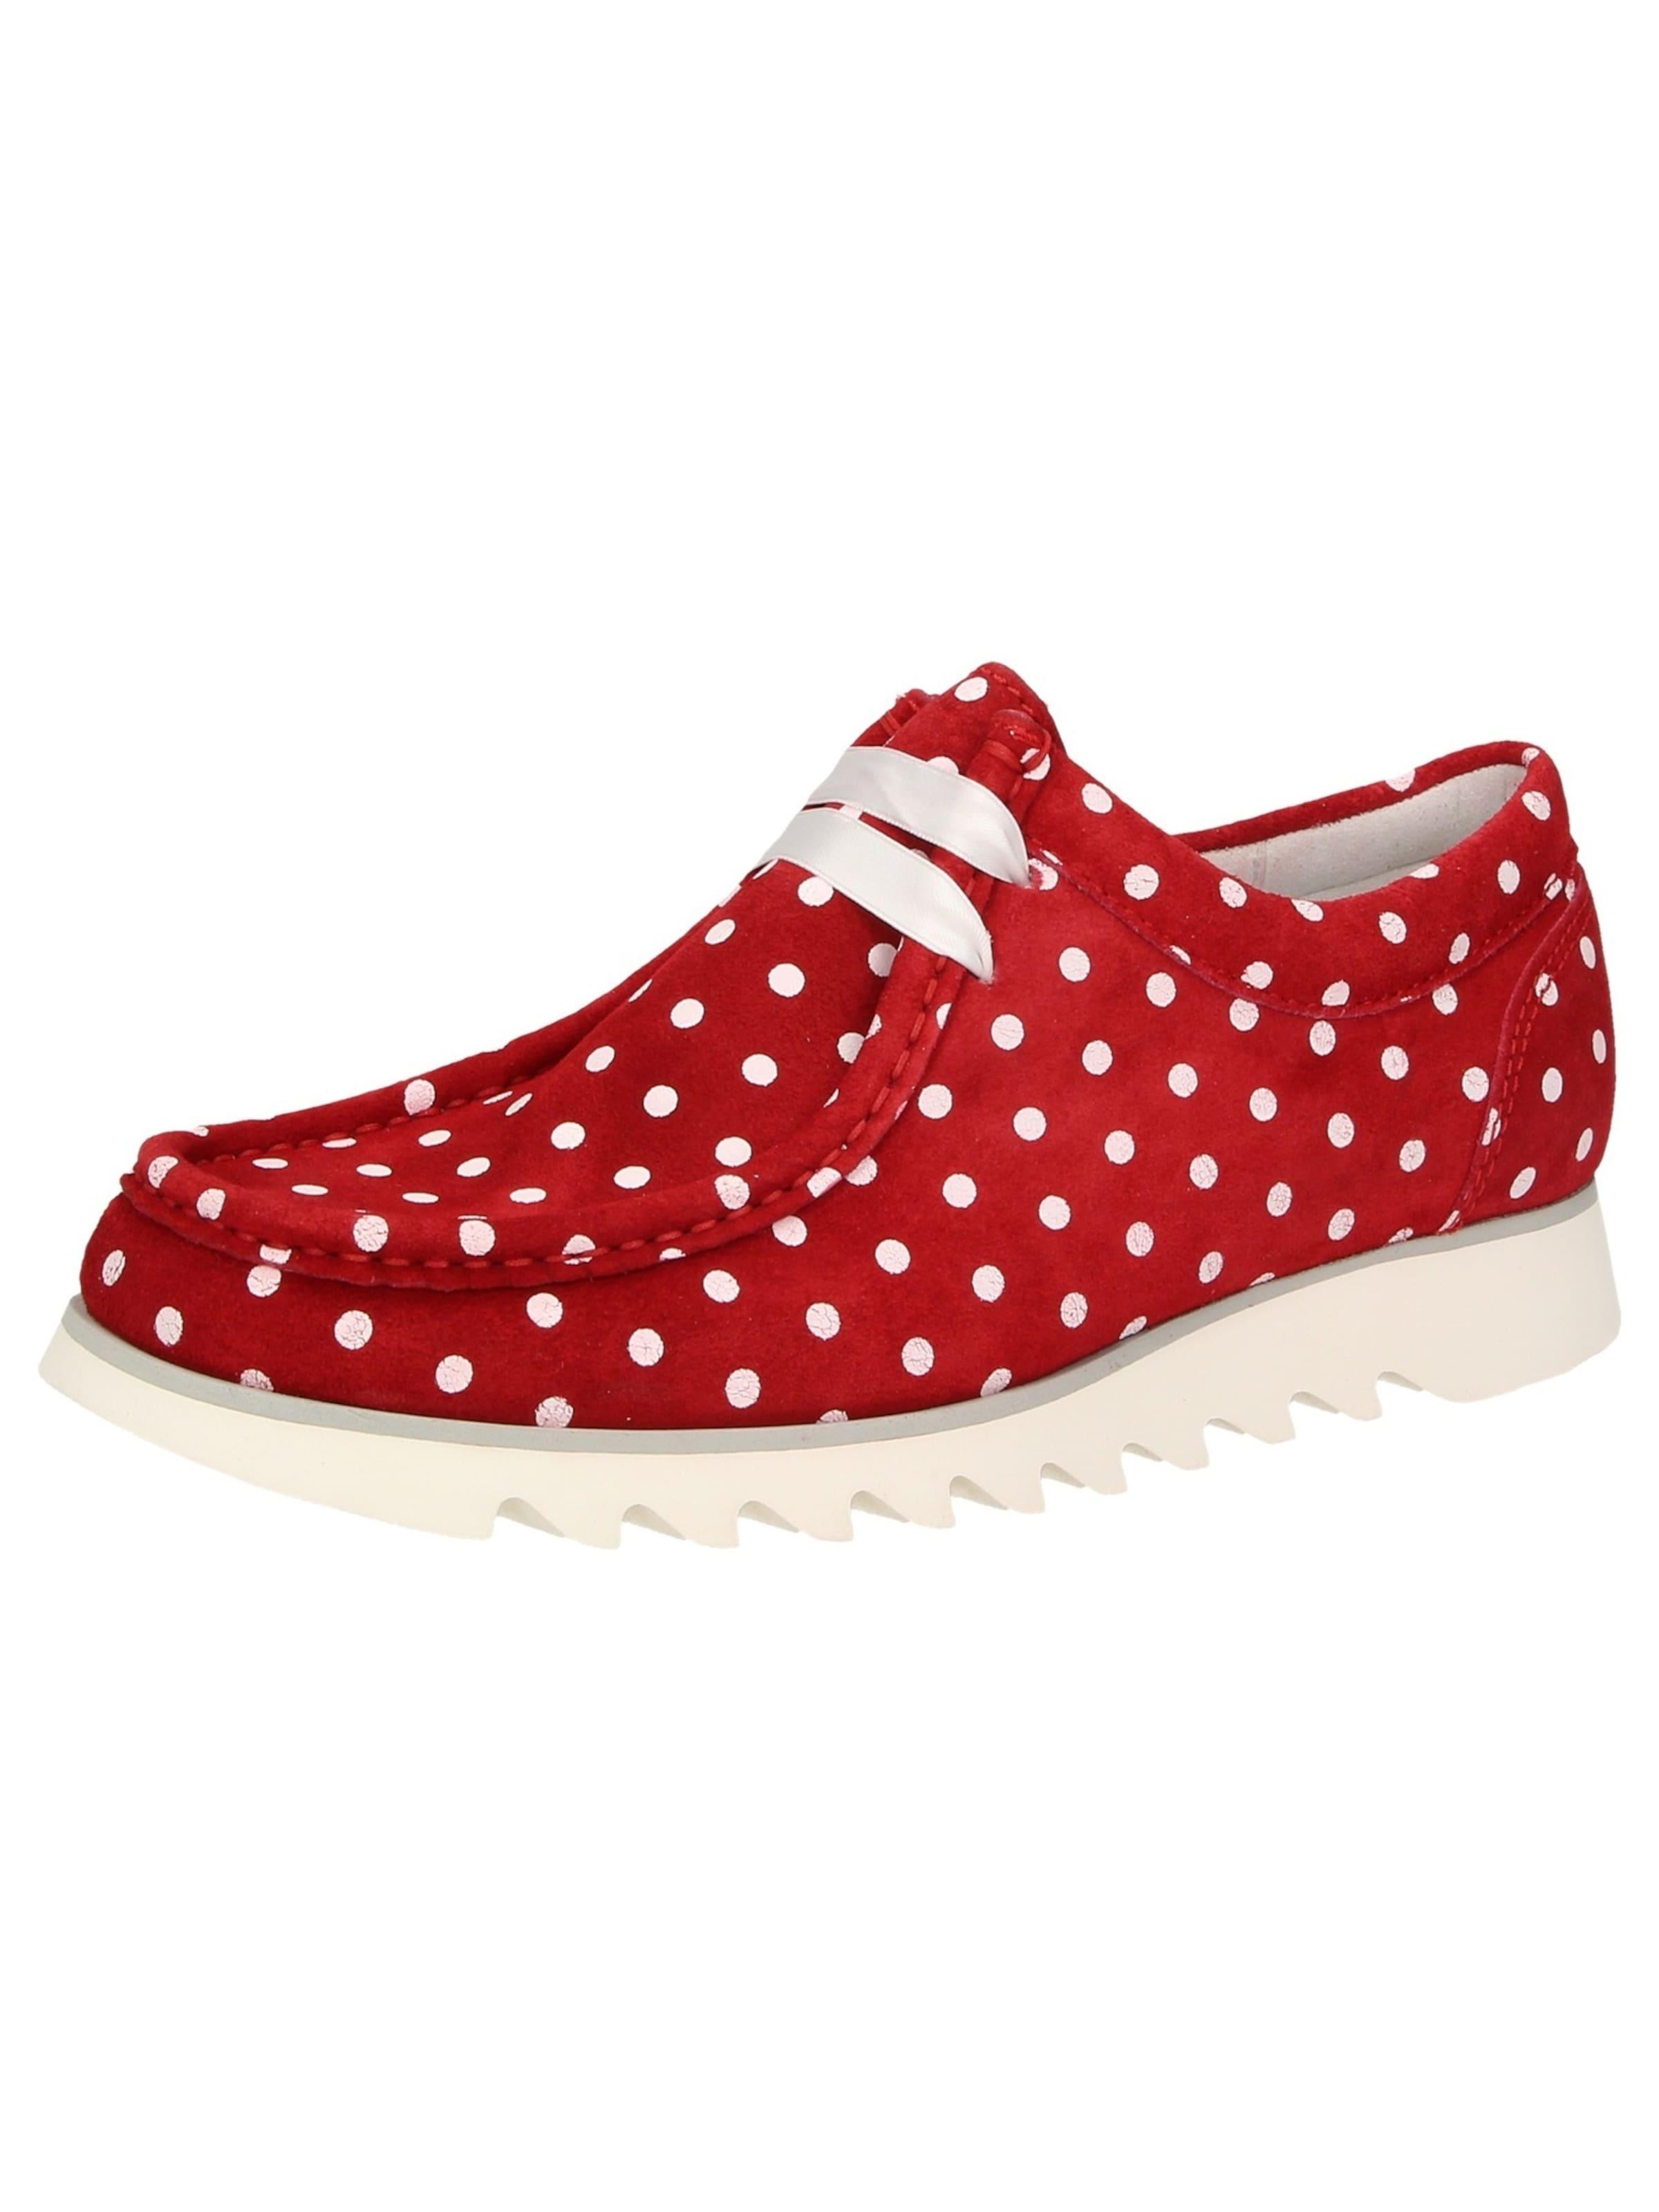 SIOUX Mokassin Grash.-D172-28 Verschleißfeste billige Schuhe